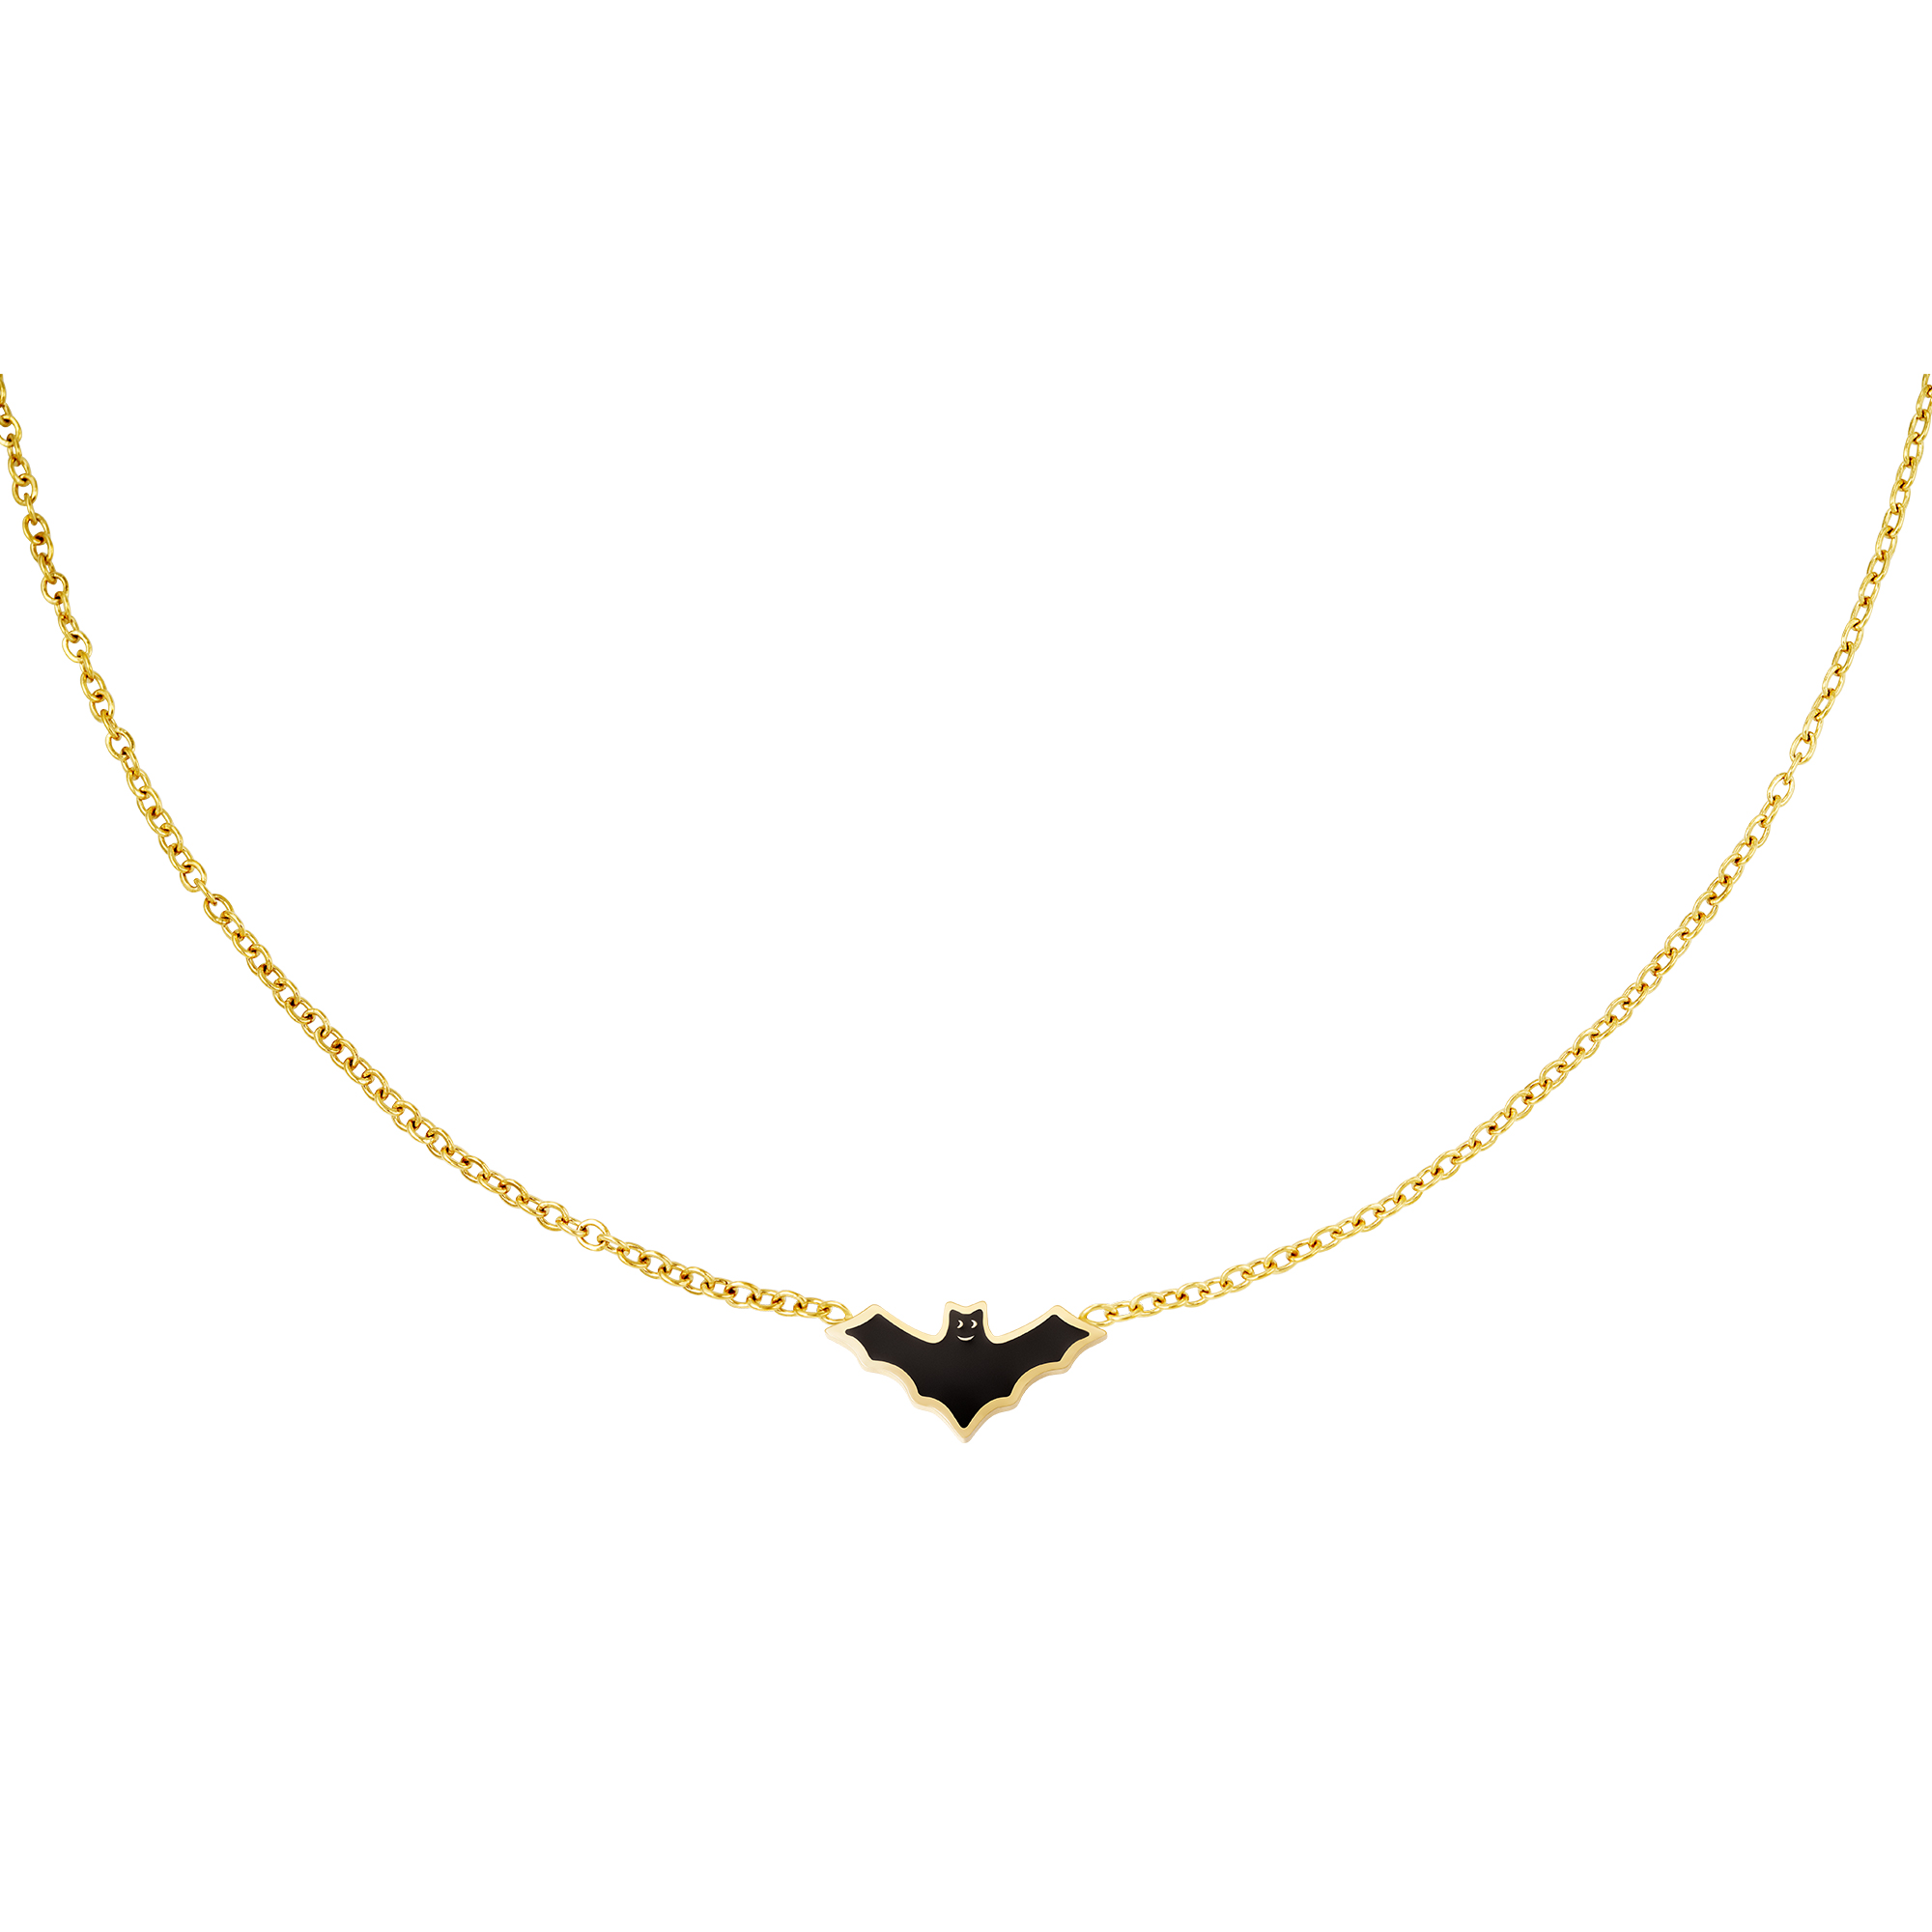 Murciélago de collar de acero inoxidable